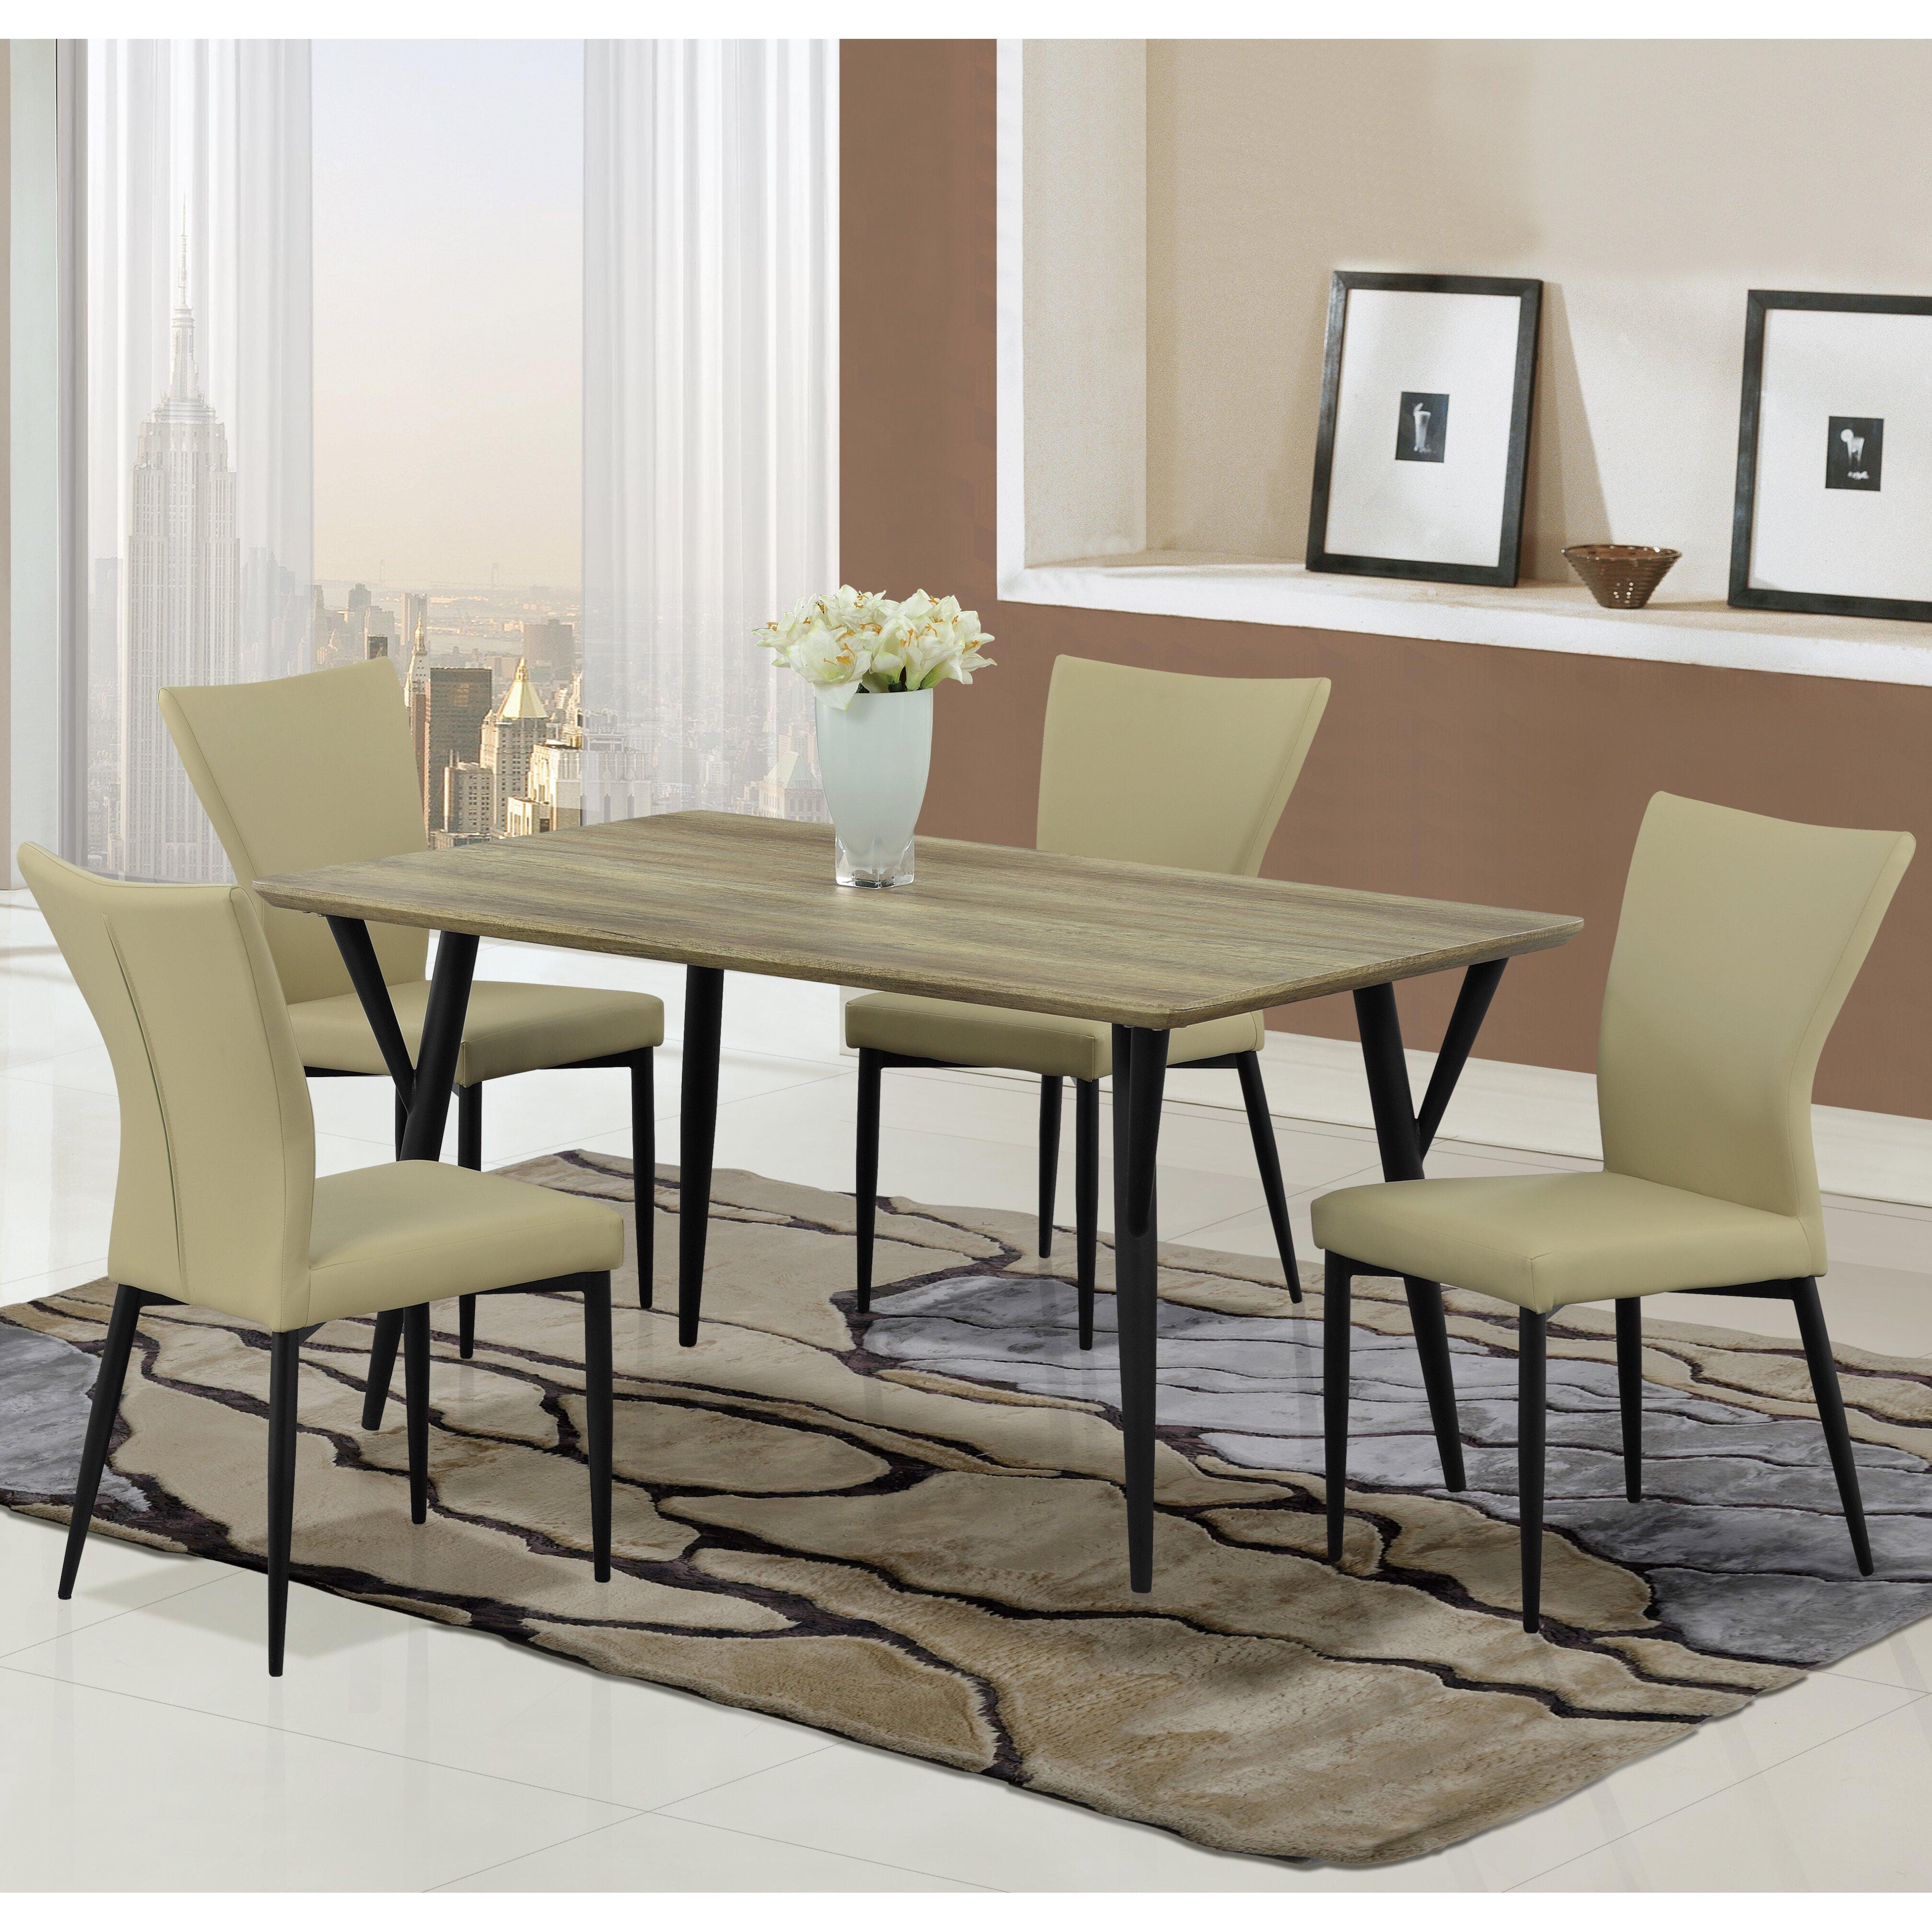 Global furniture usa dining table wayfair